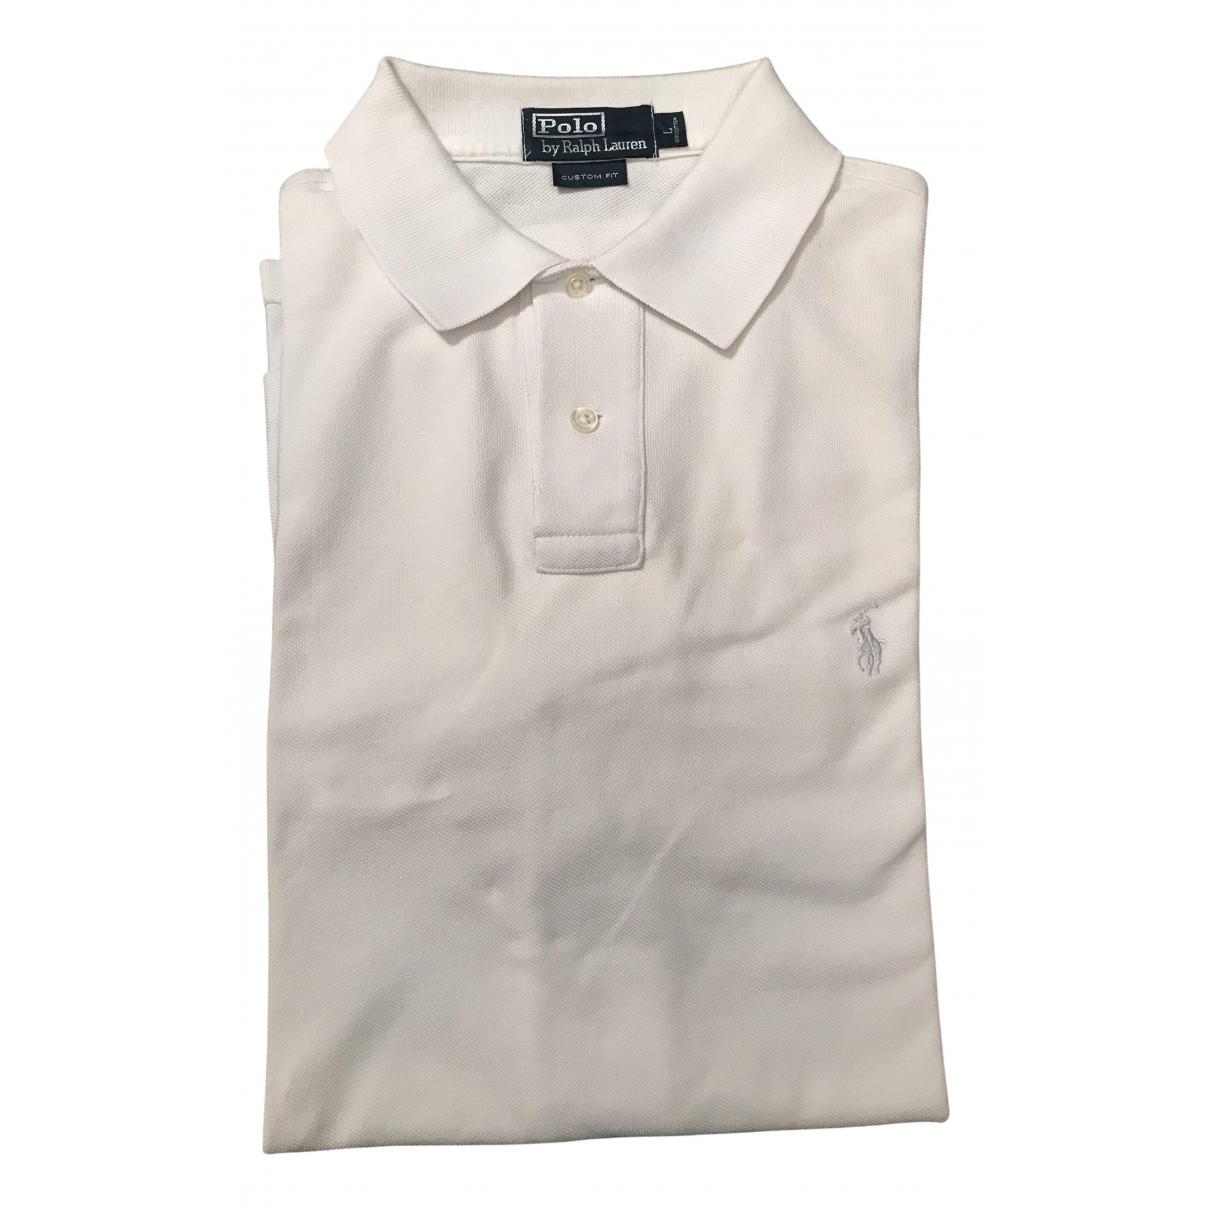 Polo Ralph Lauren \N Poloshirts in  Weiss Baumwolle